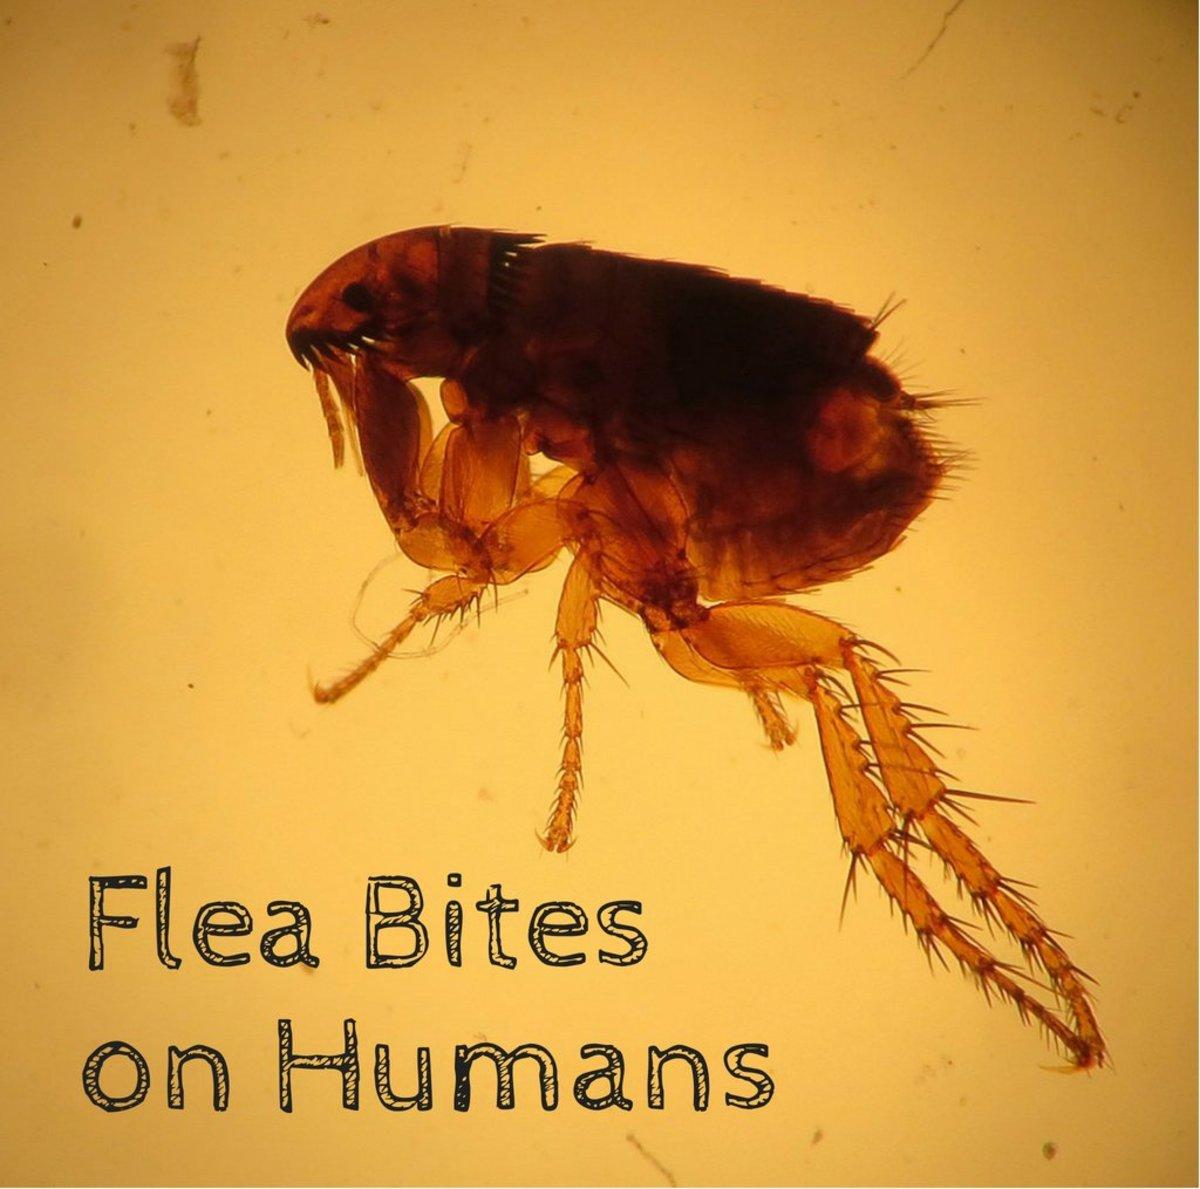 Flea Bites on Humans: Symptoms and Treatment